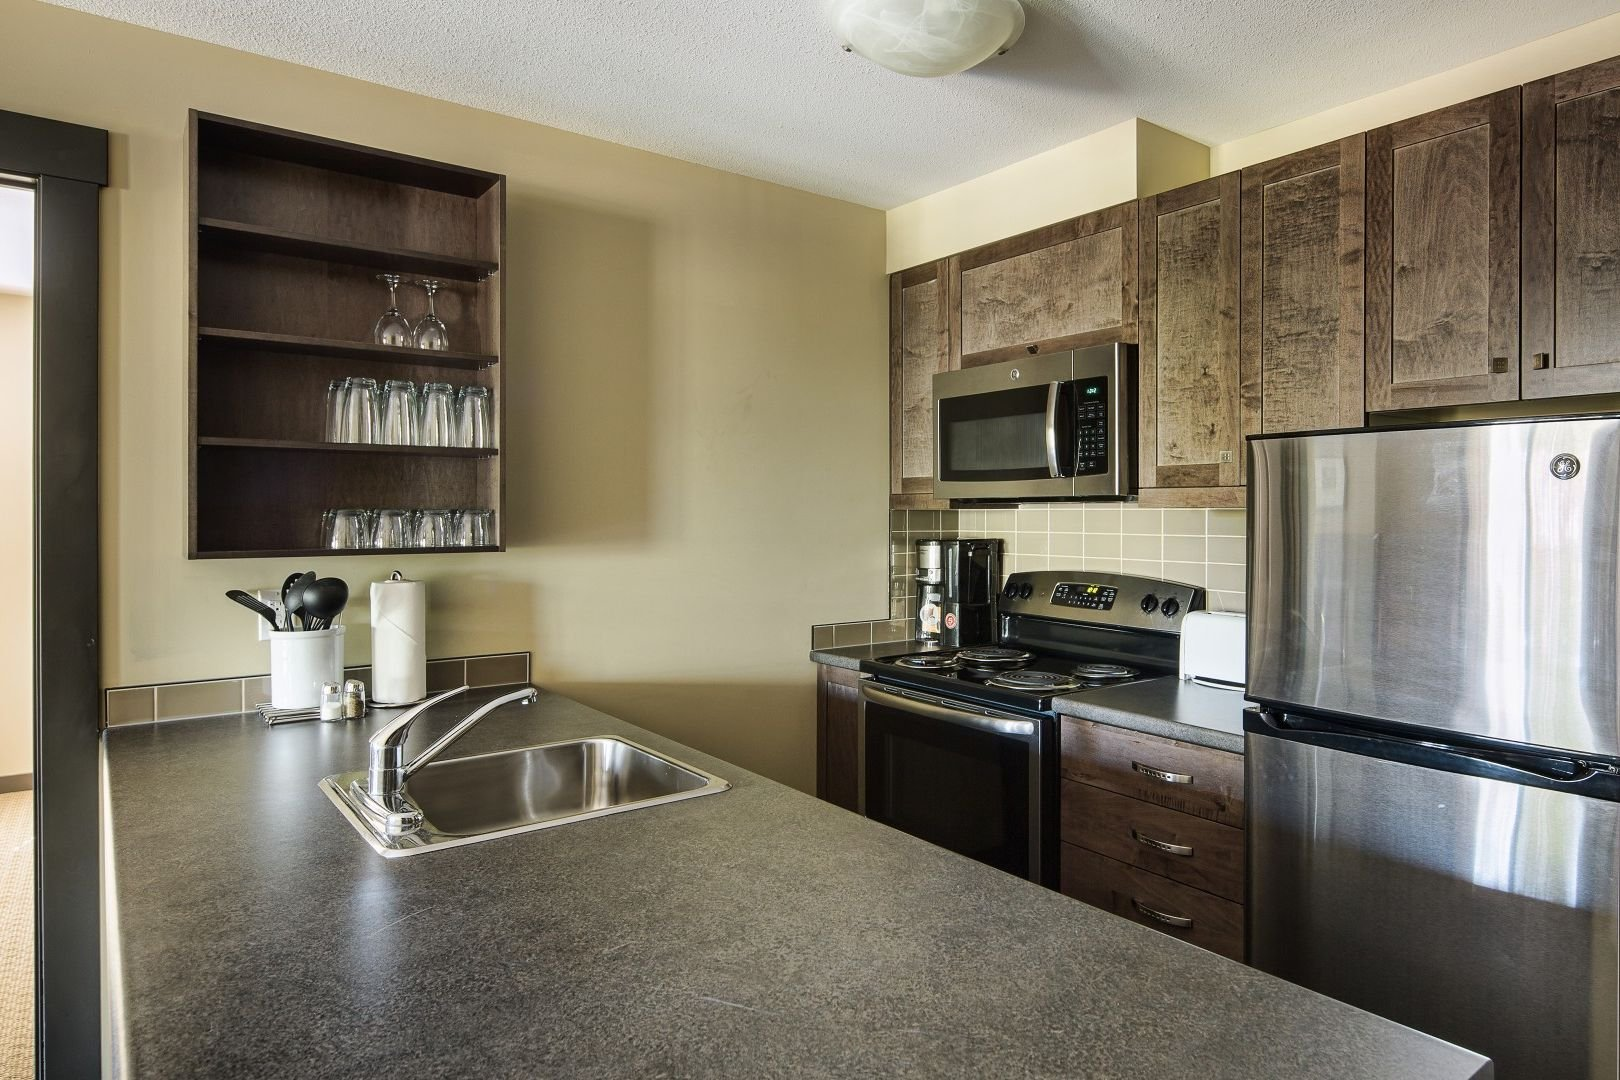 Panorama Mountain Village - 1000 peaks lodge kitchen.jpg